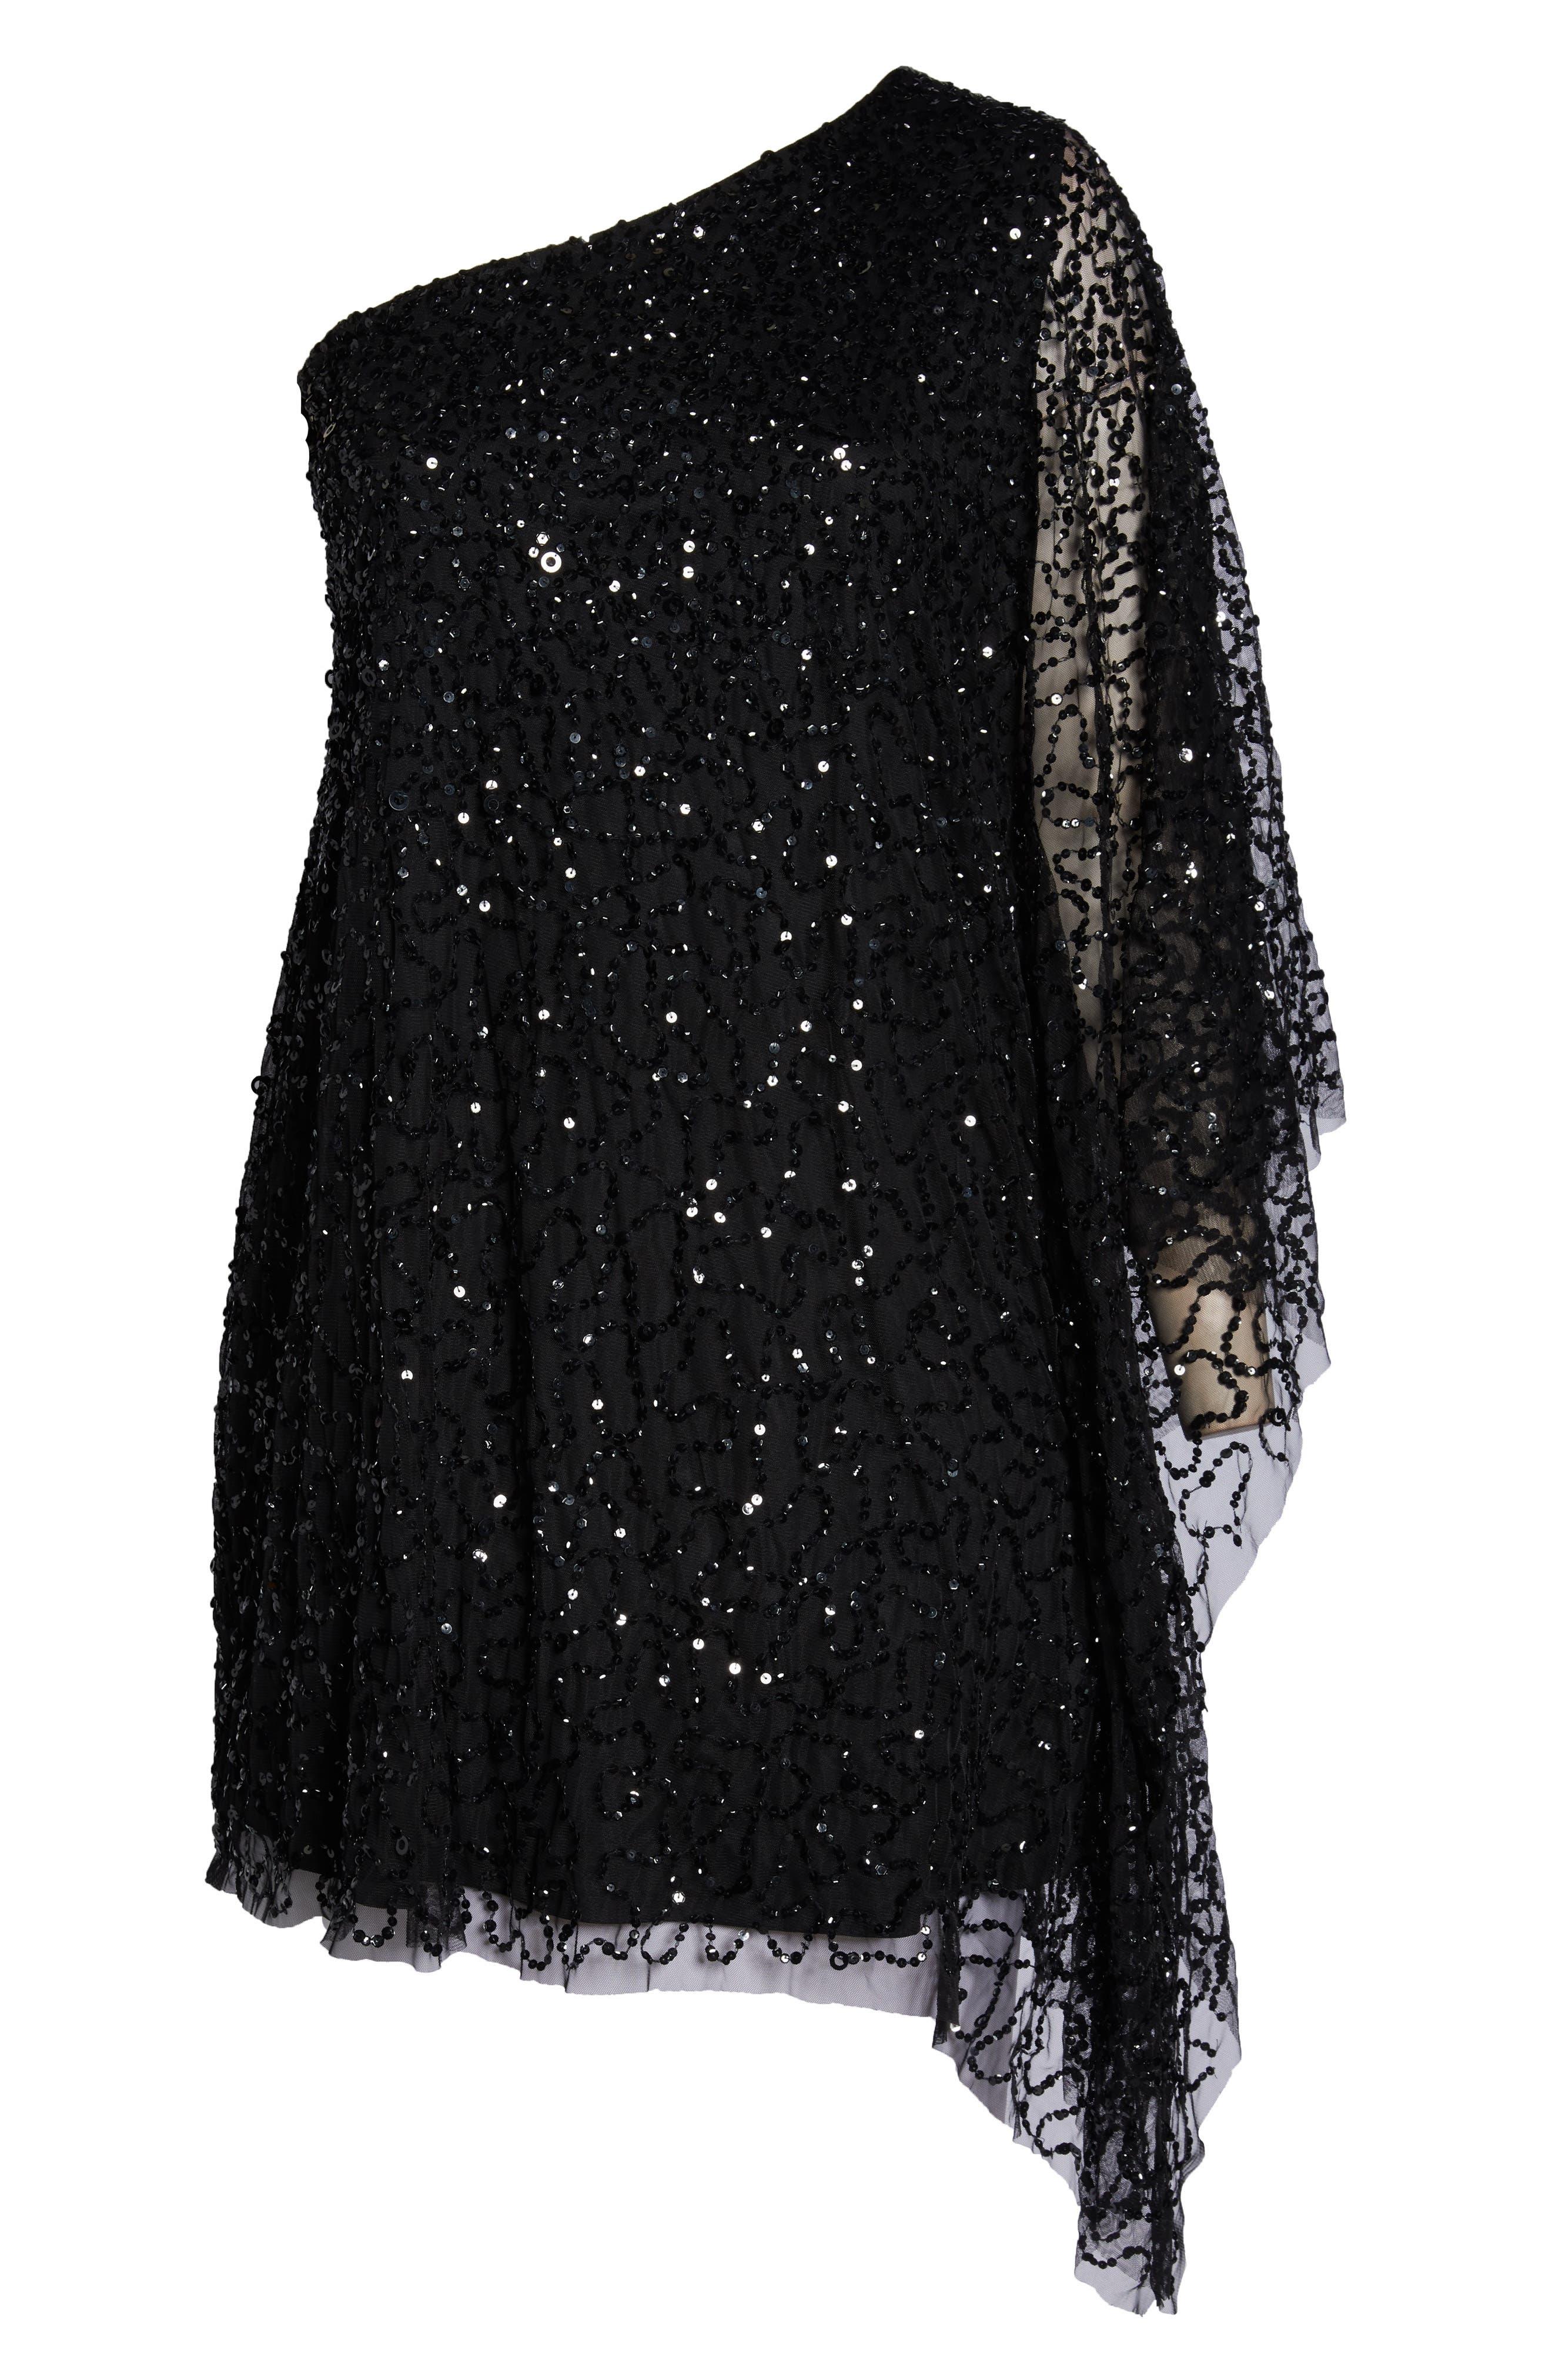 Beaded One-Shoulder Sheath Dress,                             Alternate thumbnail 7, color,                             BLACK